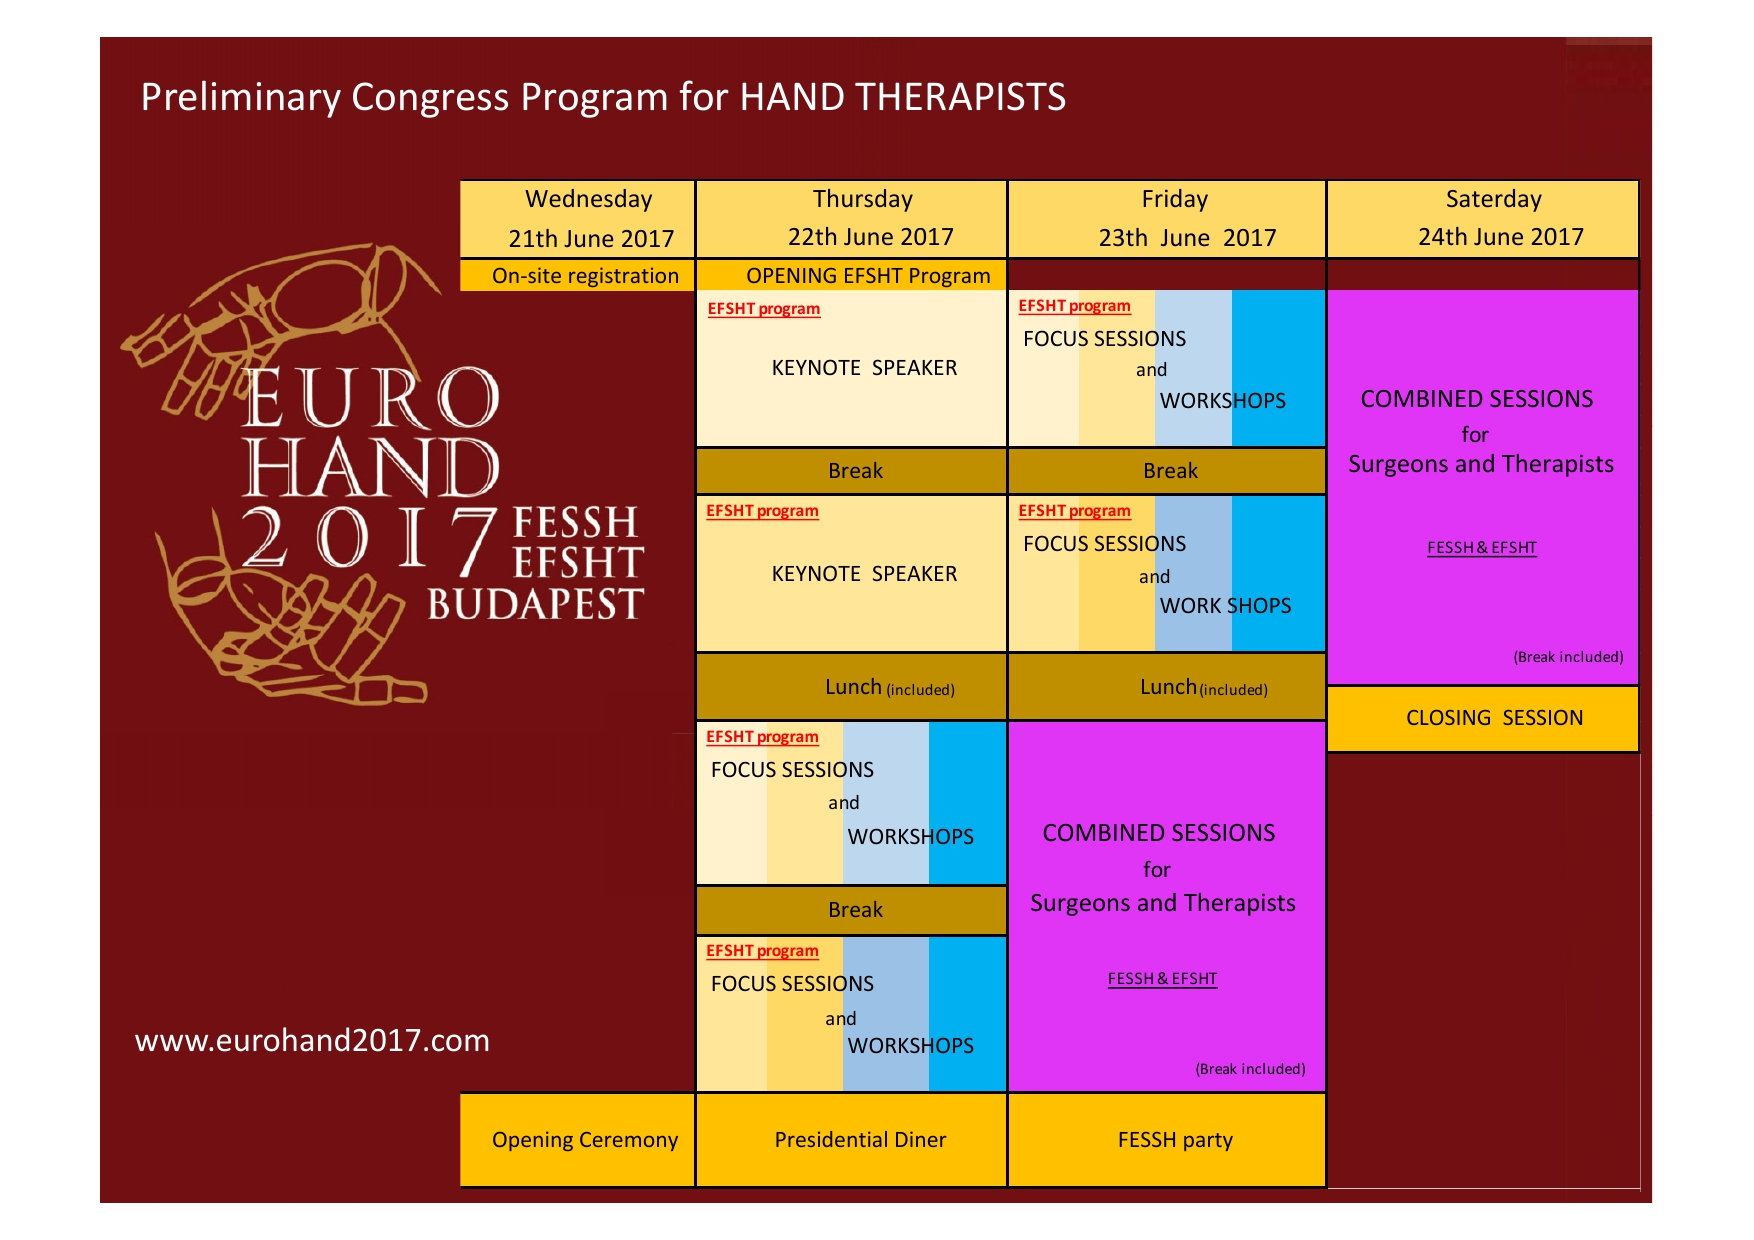 2017-01-03 EUROHAND preliminary program.jpg